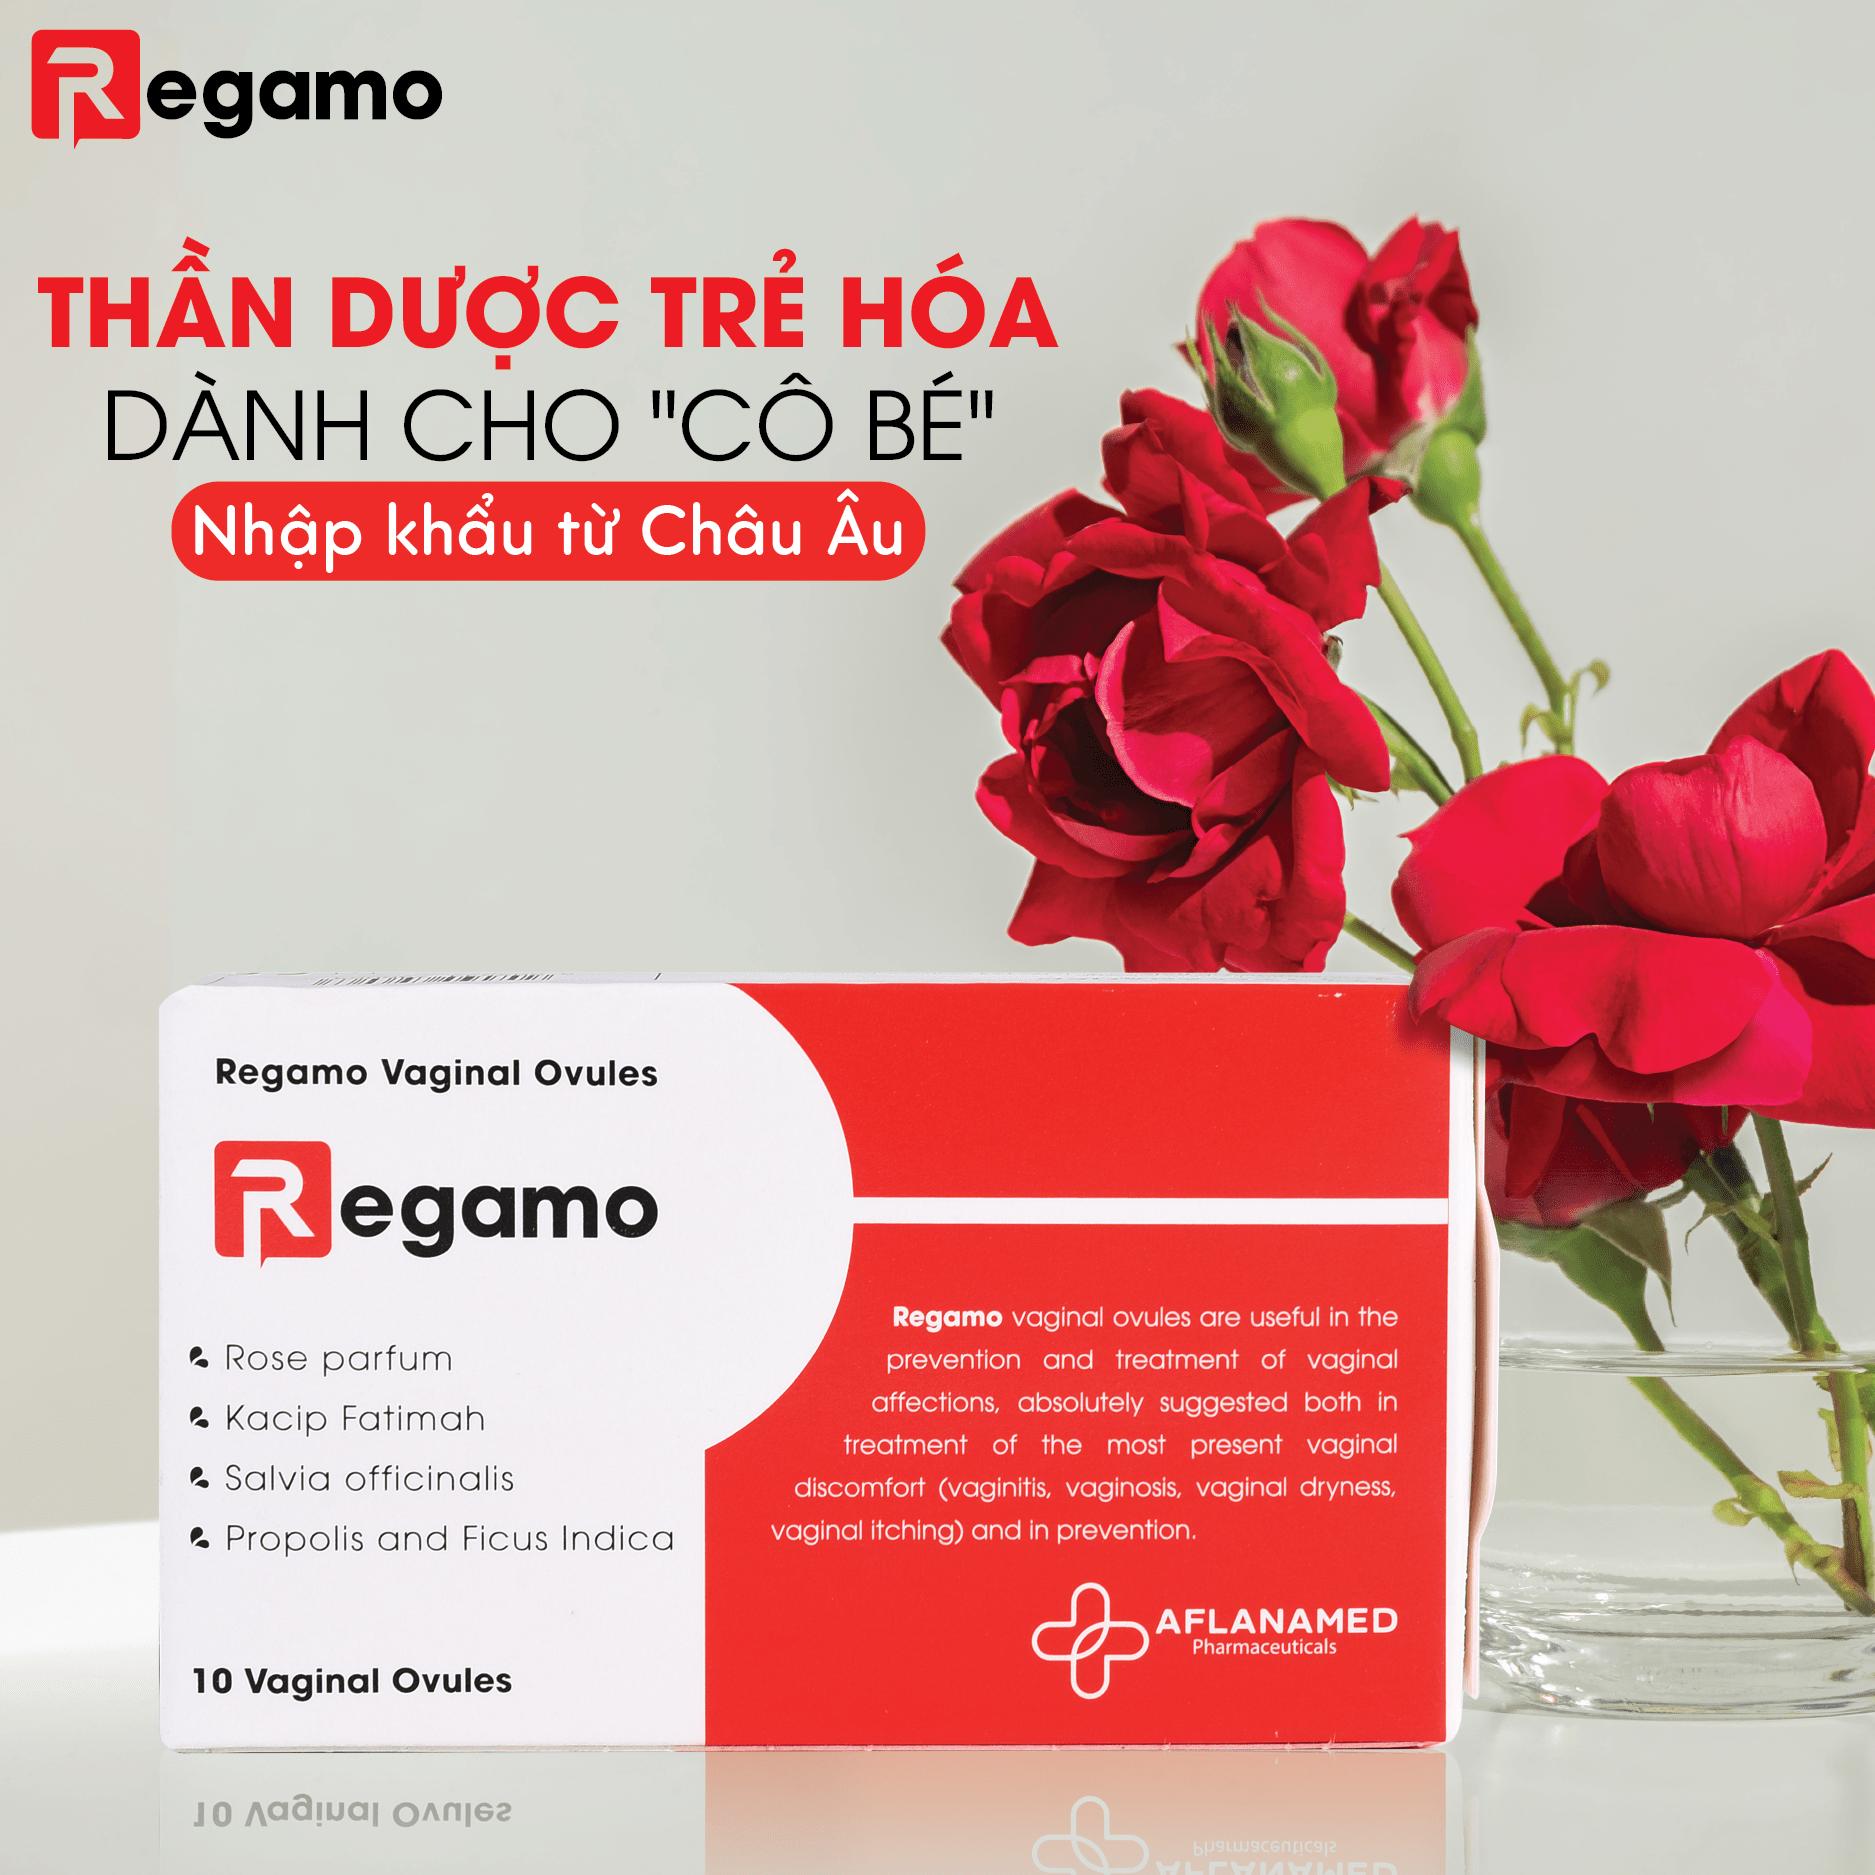 Sản phẩm viên đặt Regamo